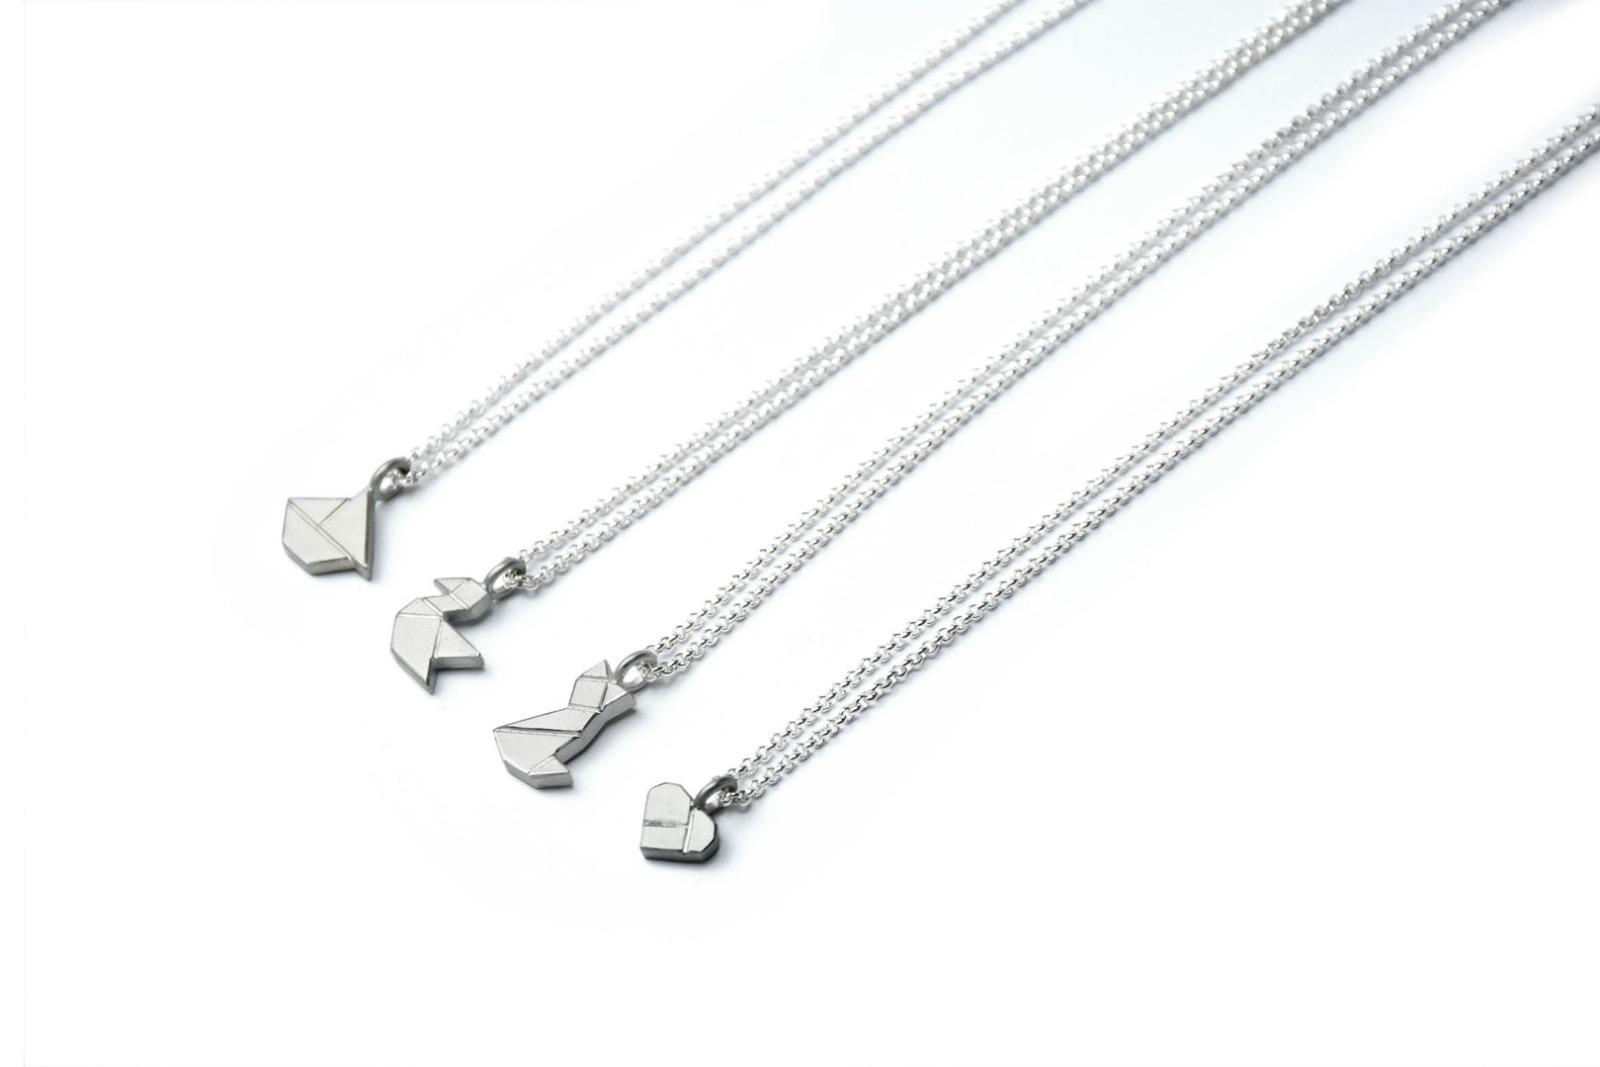 Tangram Kette MIEZE 935 Silber 4